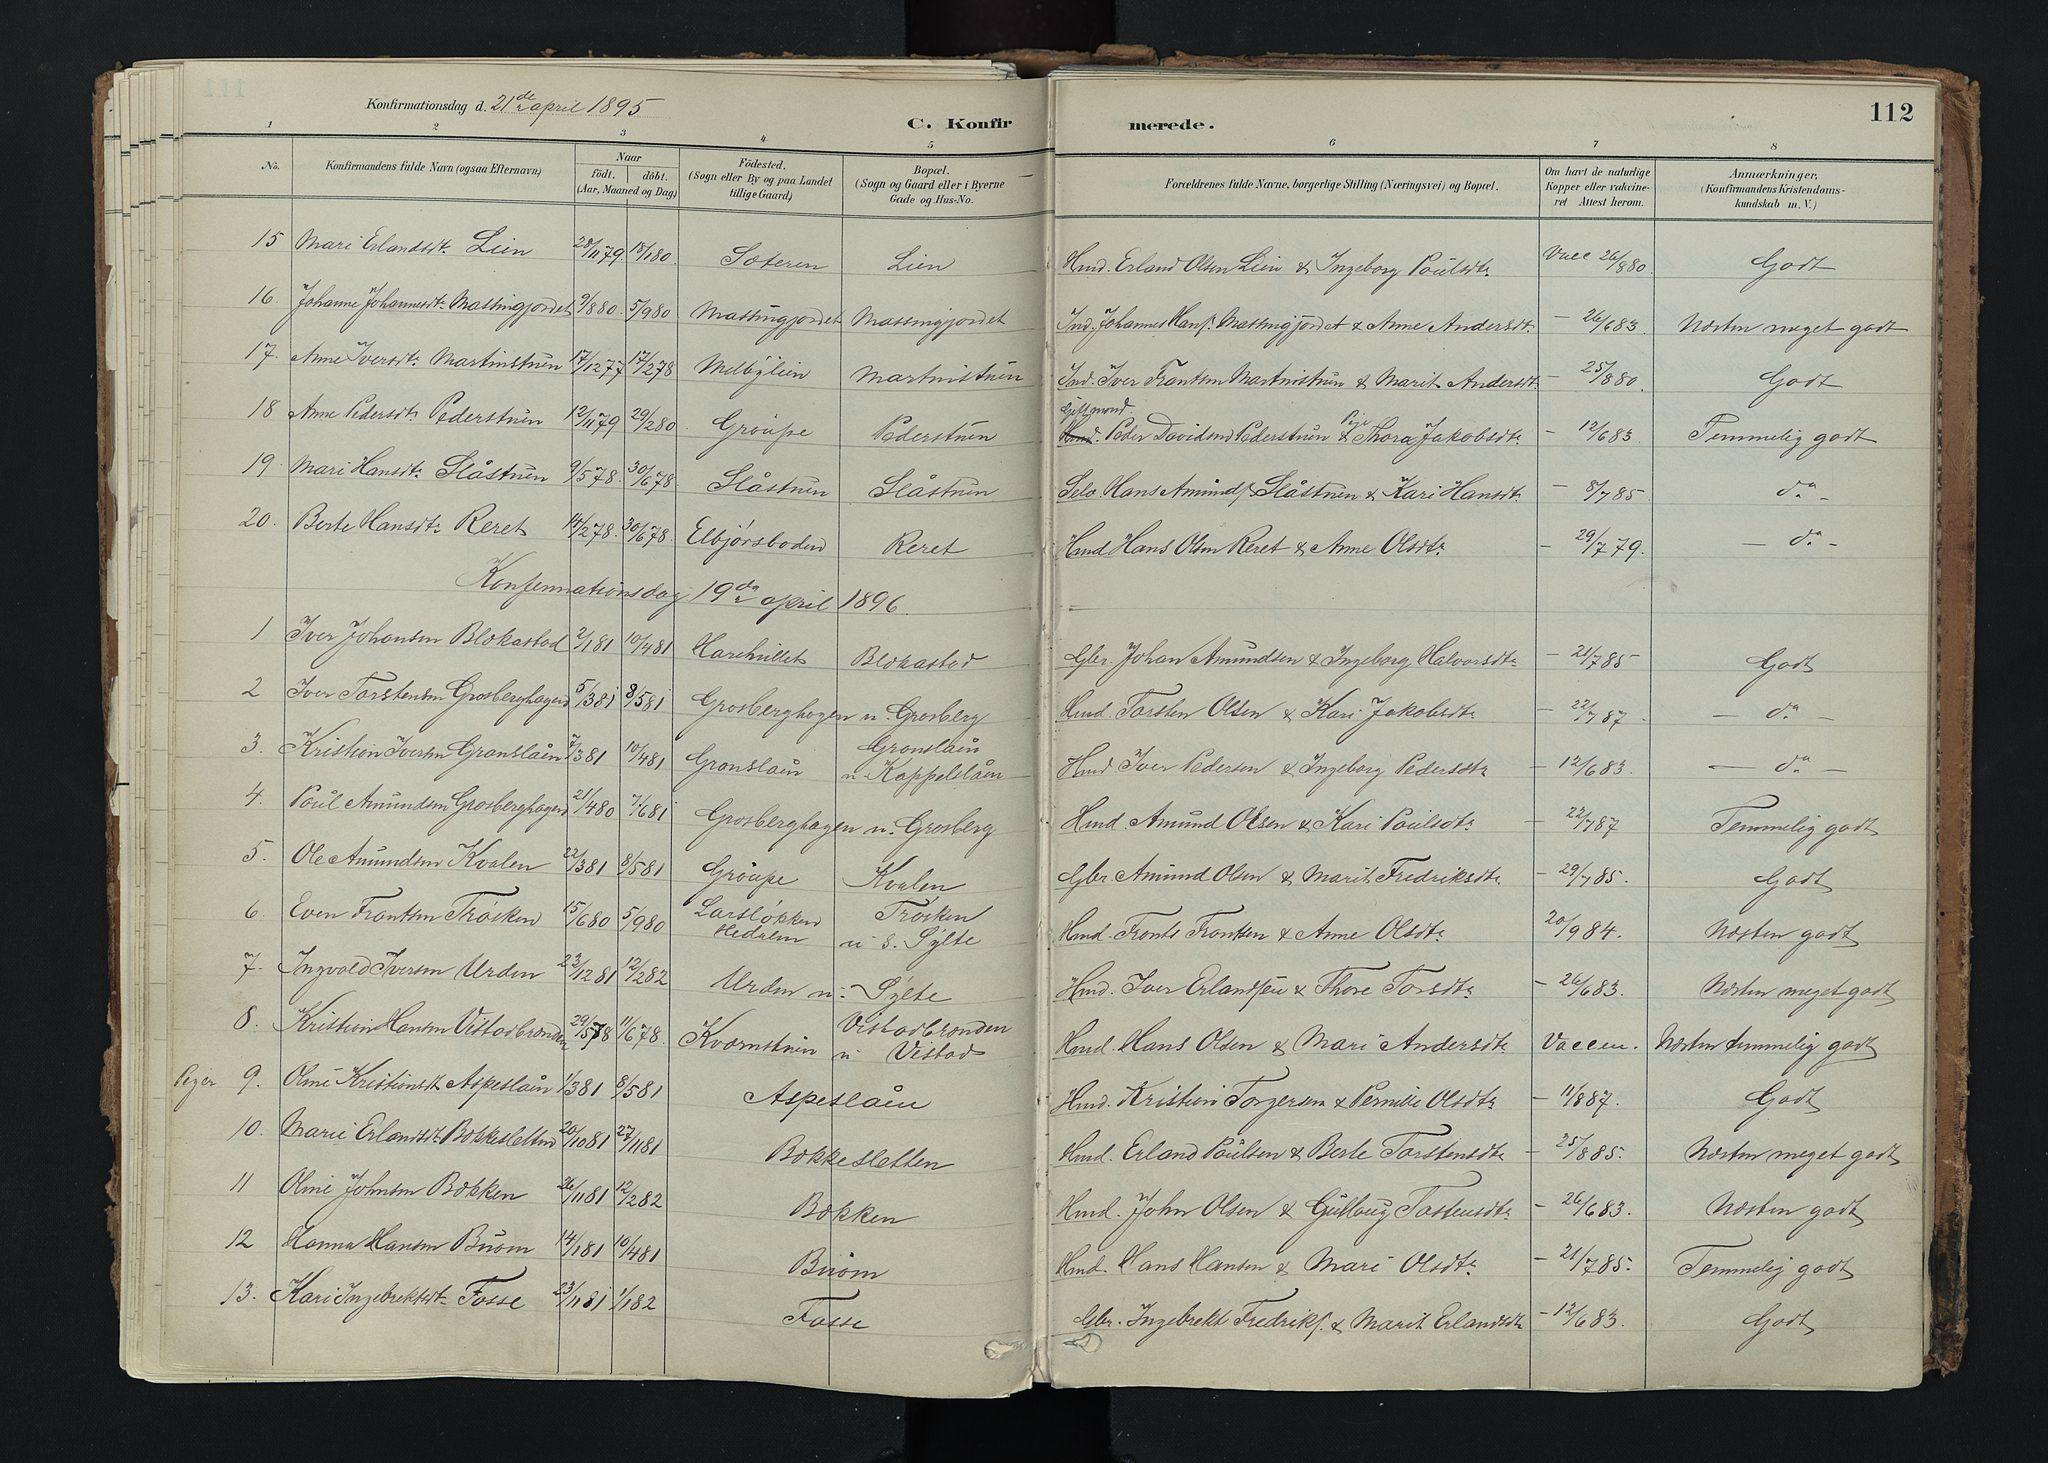 SAH, Nord-Fron prestekontor, Ministerialbok nr. 5, 1884-1914, s. 112